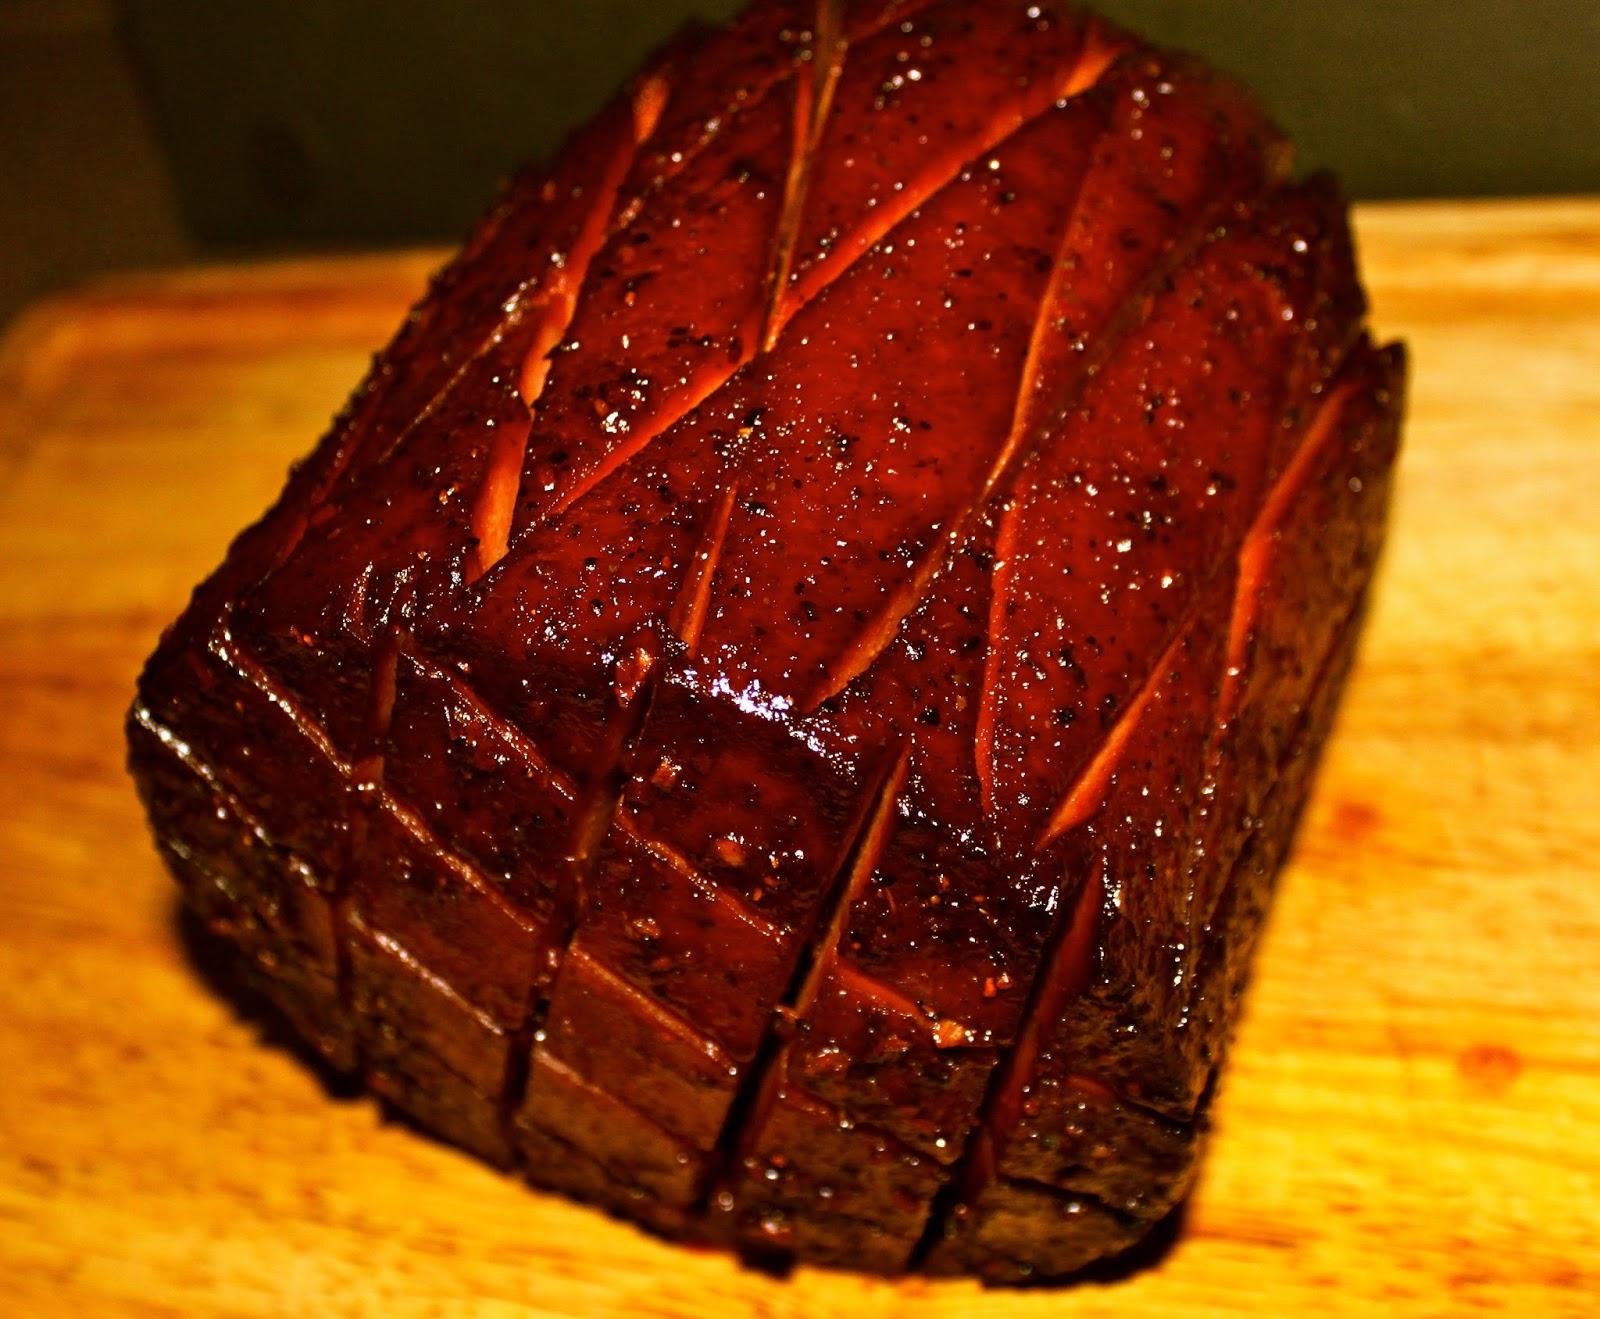 MMMGOBLUBBQ: Smoked Bologna w/ Wing Sauce